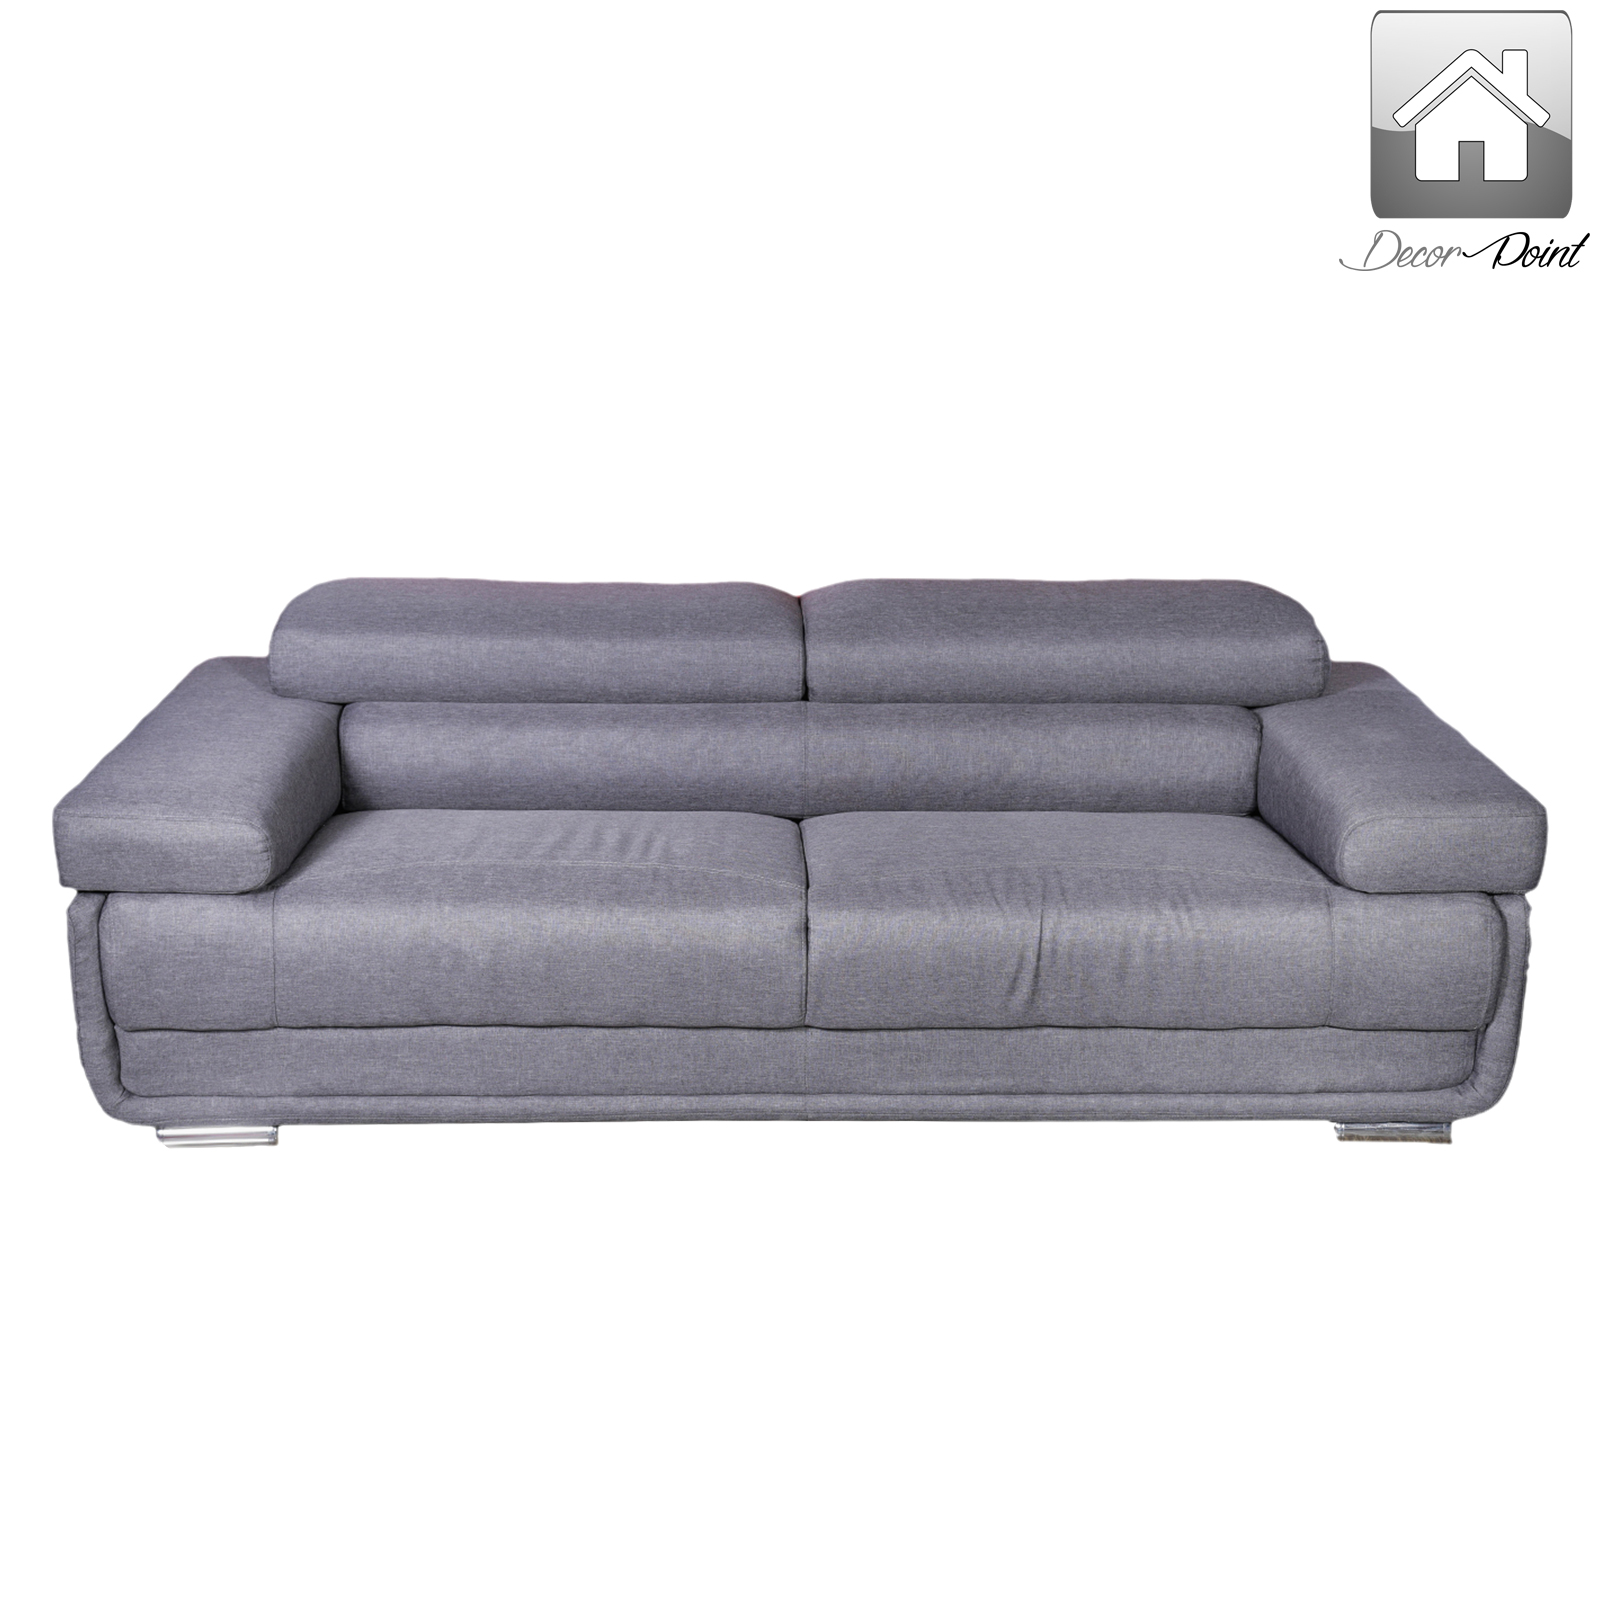 New Luxury Grey Brighton 3 Seater Fabric Sofa With Gas